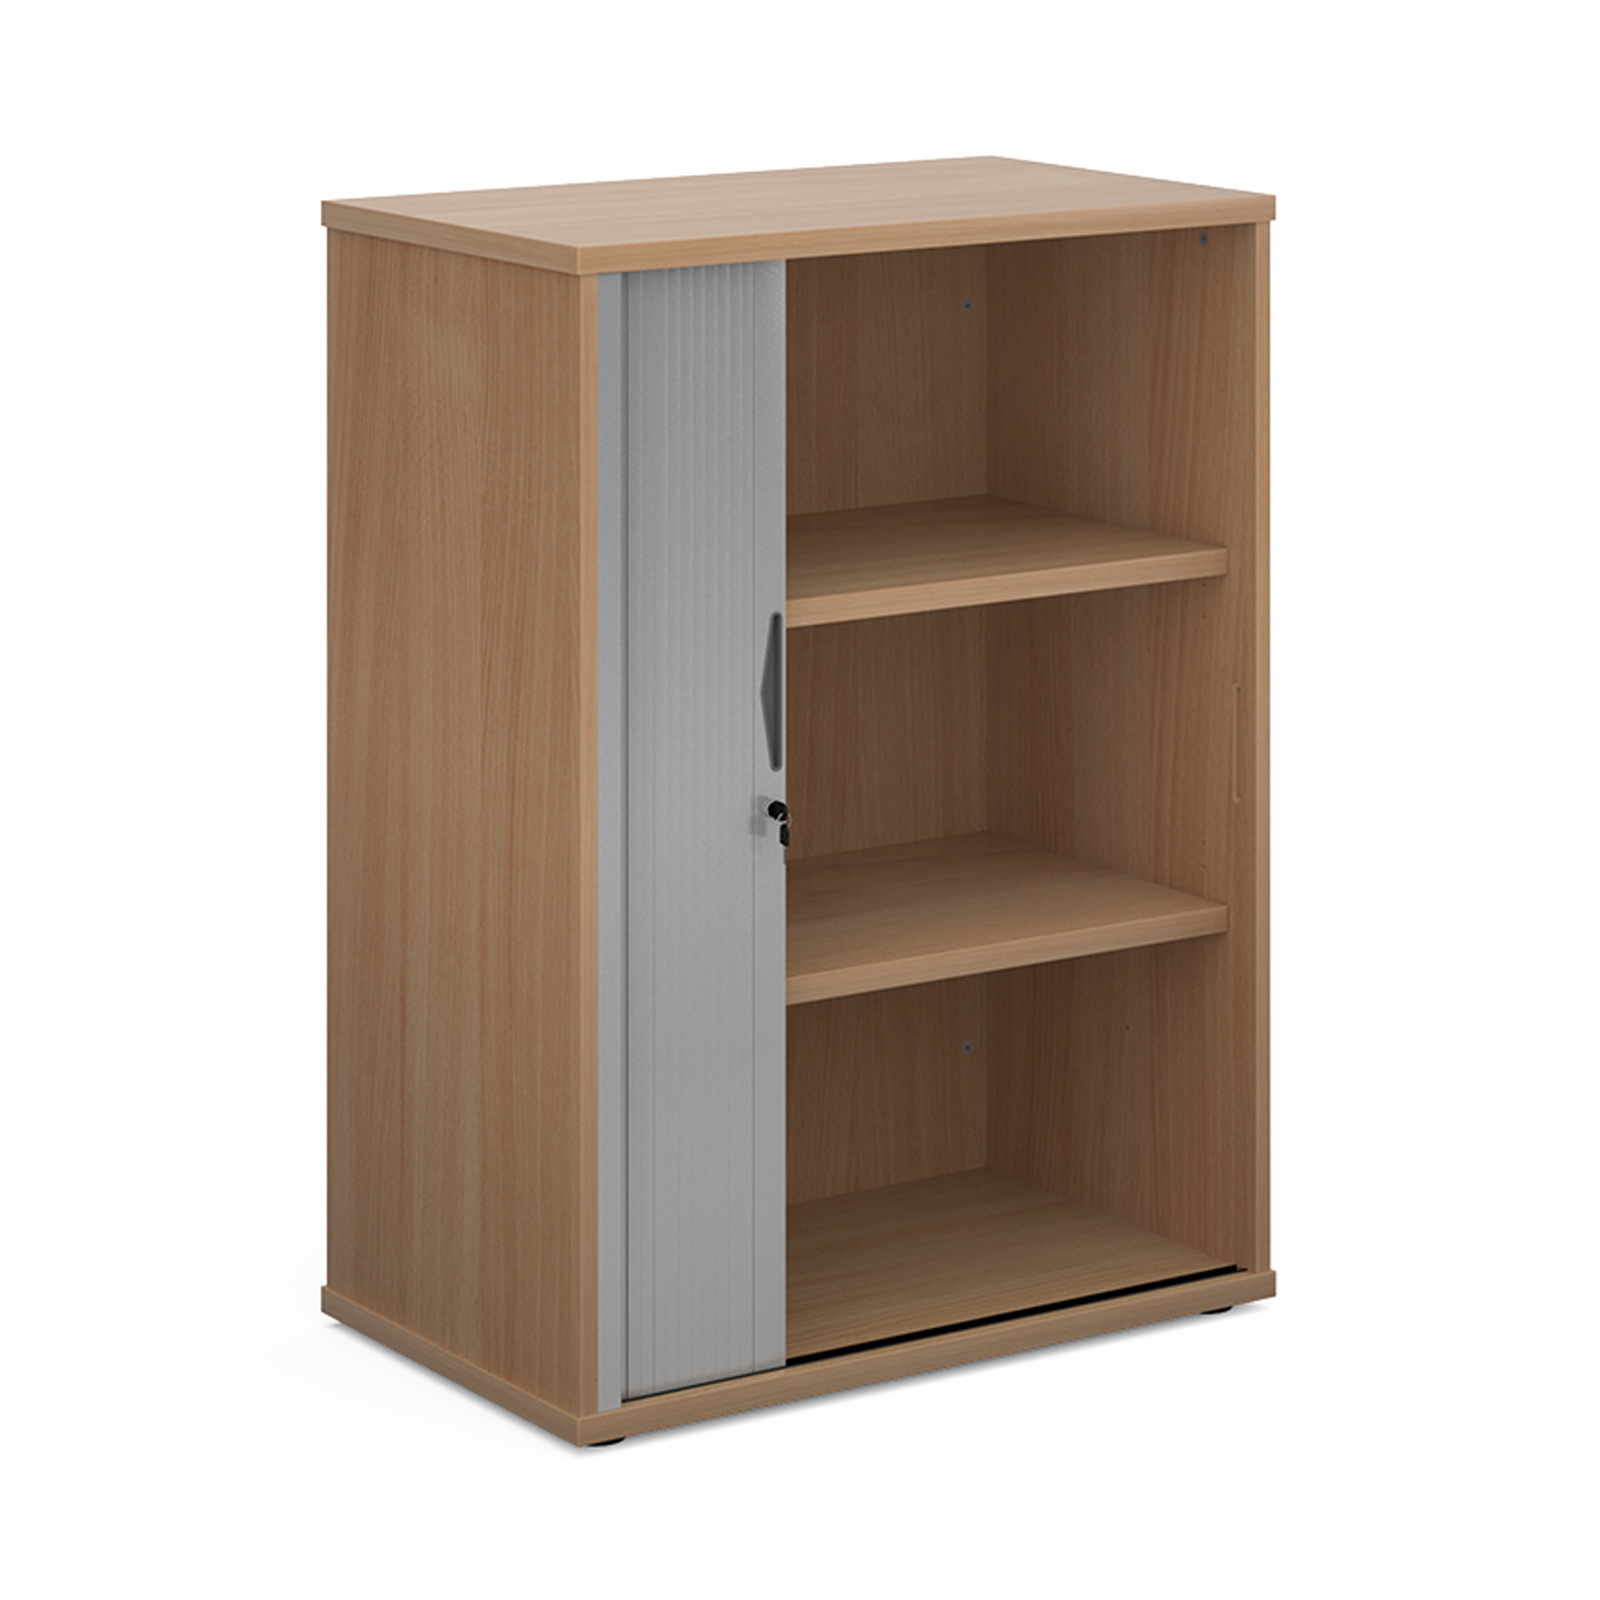 Up to 1200mm High Universal single door tambour cupboard 1090mm high with 2 shelves - beech with silver door